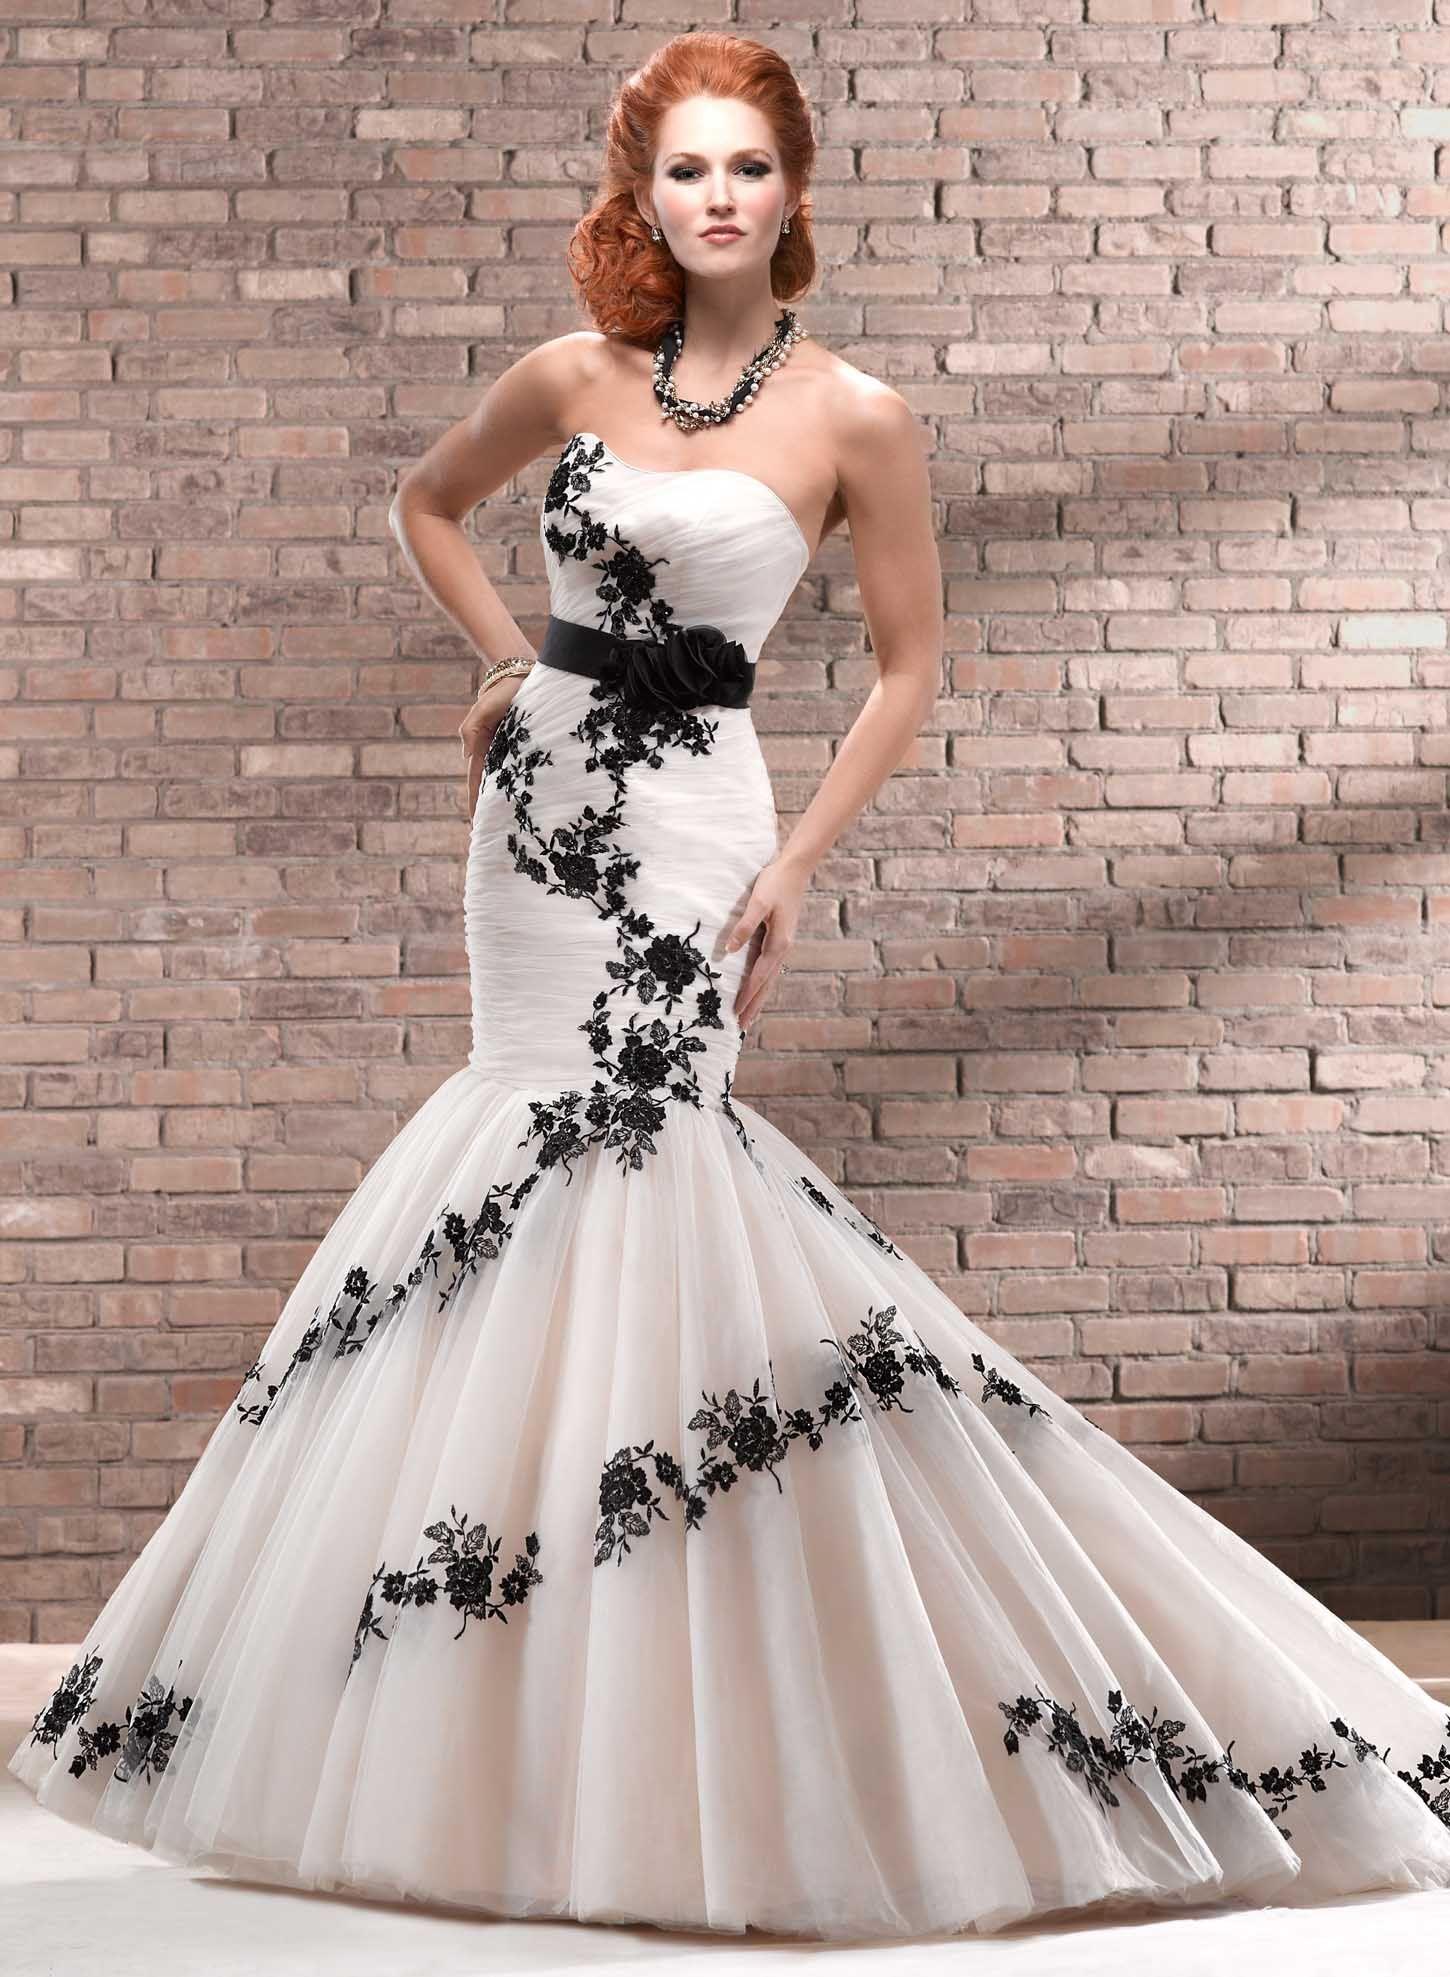 Wedding Dress Colours God S Grace Weddings Black Lace Wedding Dress Black Lace Wedding Black White Wedding Dress [ 1977 x 1450 Pixel ]